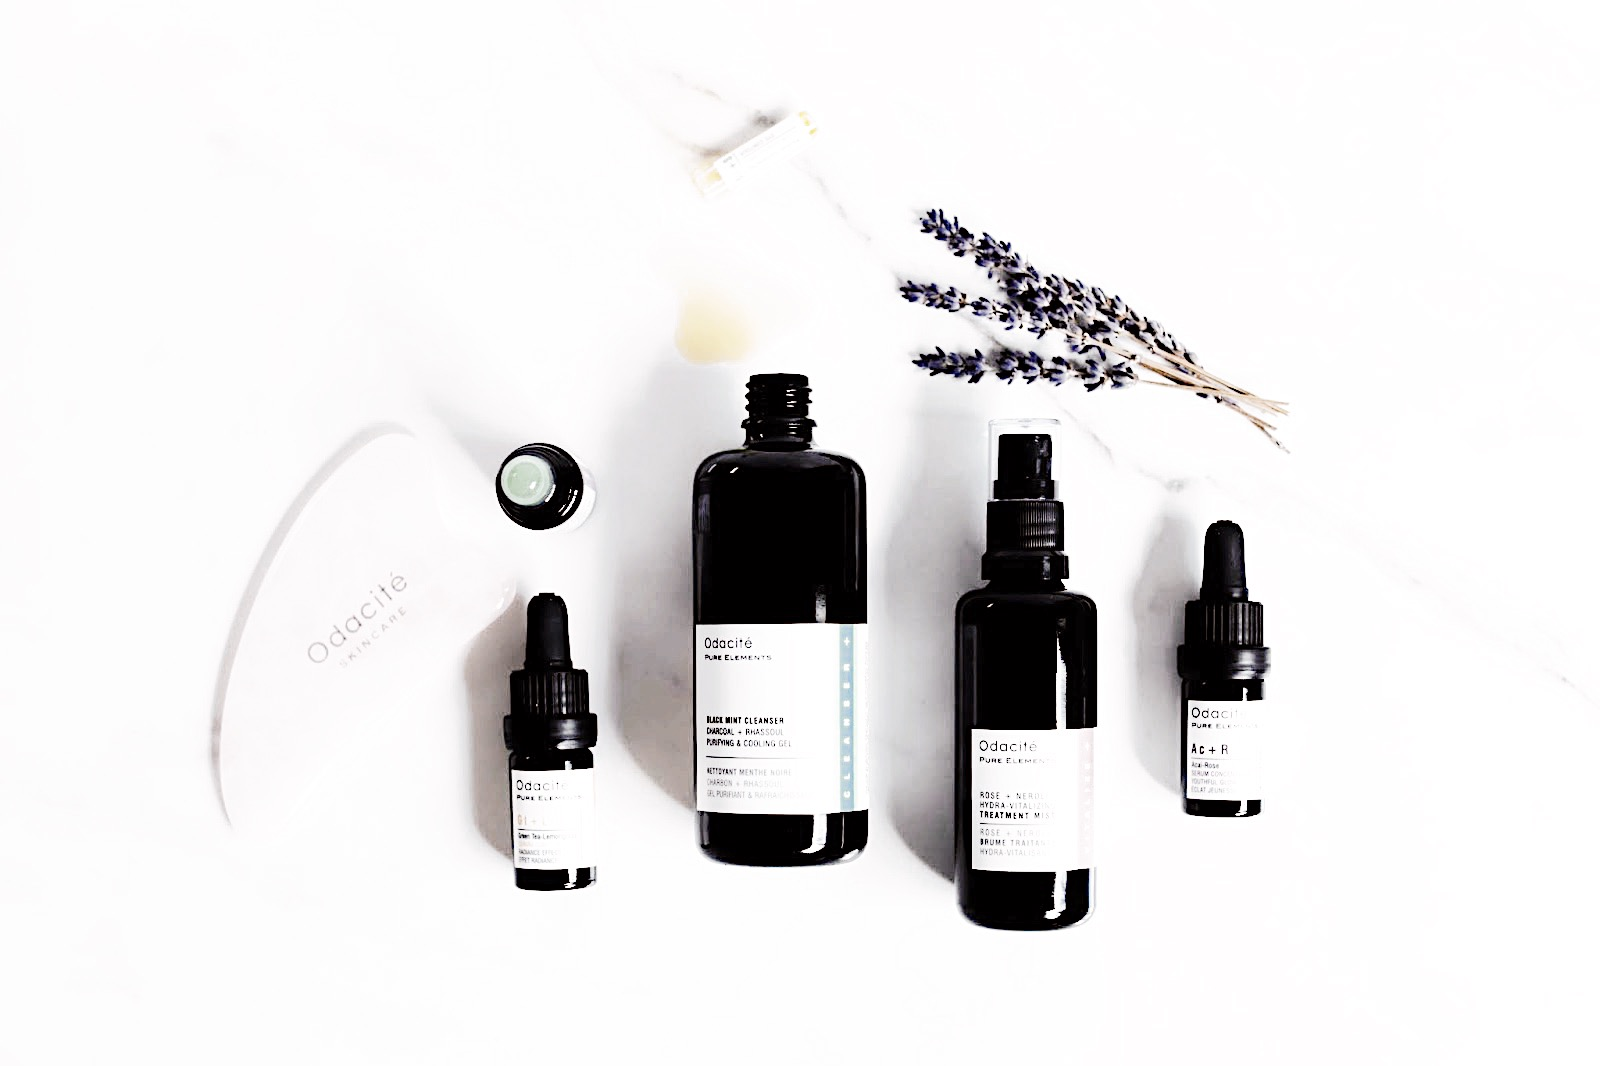 odacité skin care soins visage serums avis test